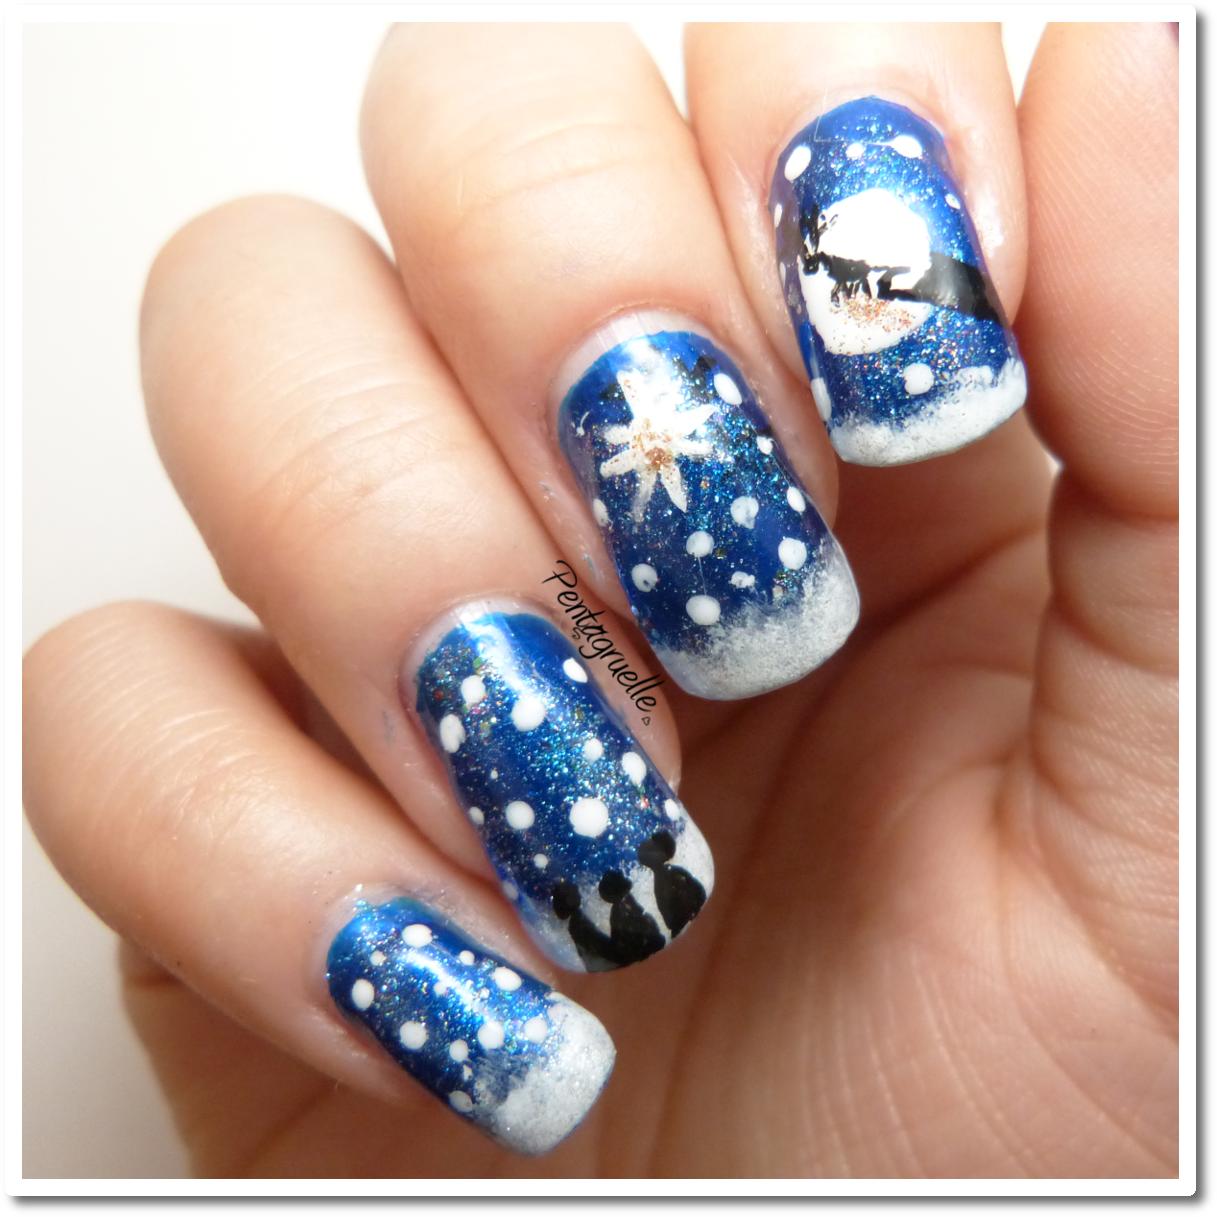 http://2.bp.blogspot.com/-2Q7xKwgl-lw/UrXmGJtXqWI/AAAAAAAAAXQ/W-8qWD68qHI/s1600/NS+Merry+christmas+Instablog.png